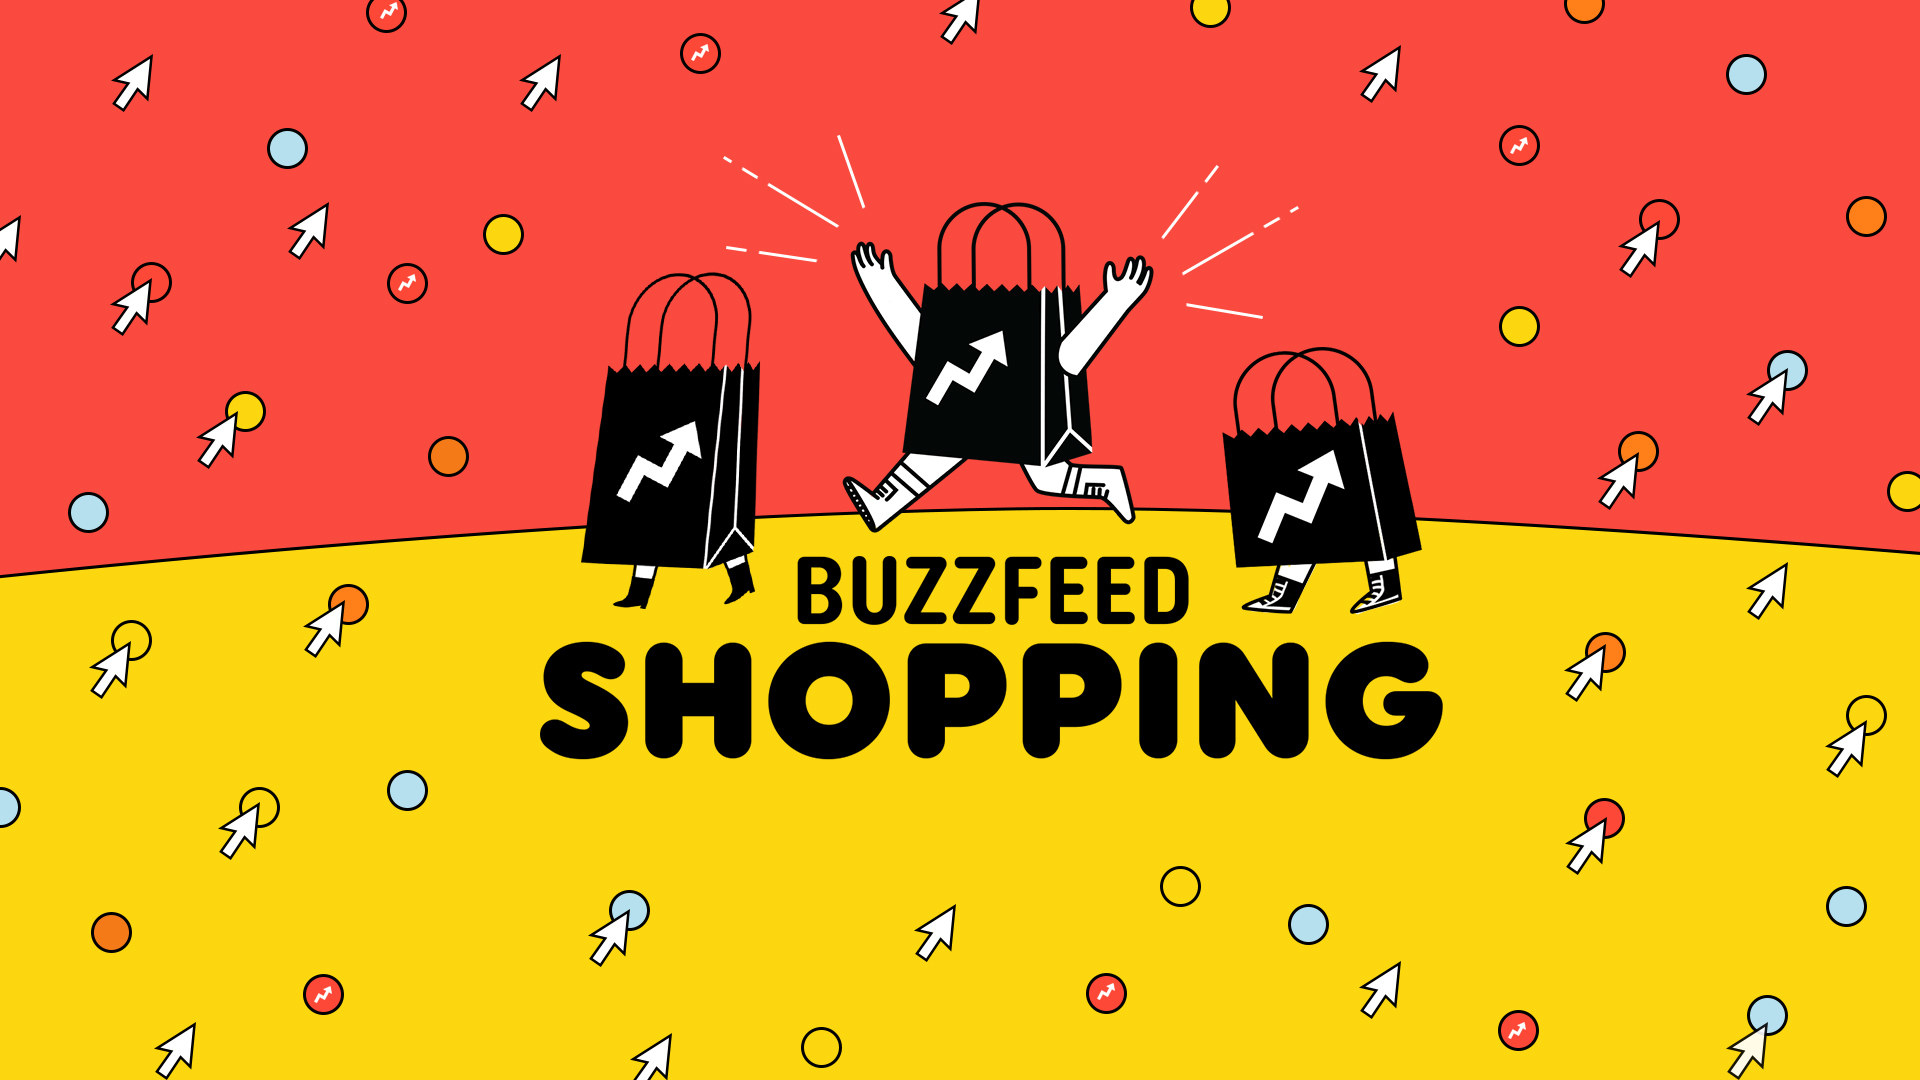 Shop BuzzFeed logo